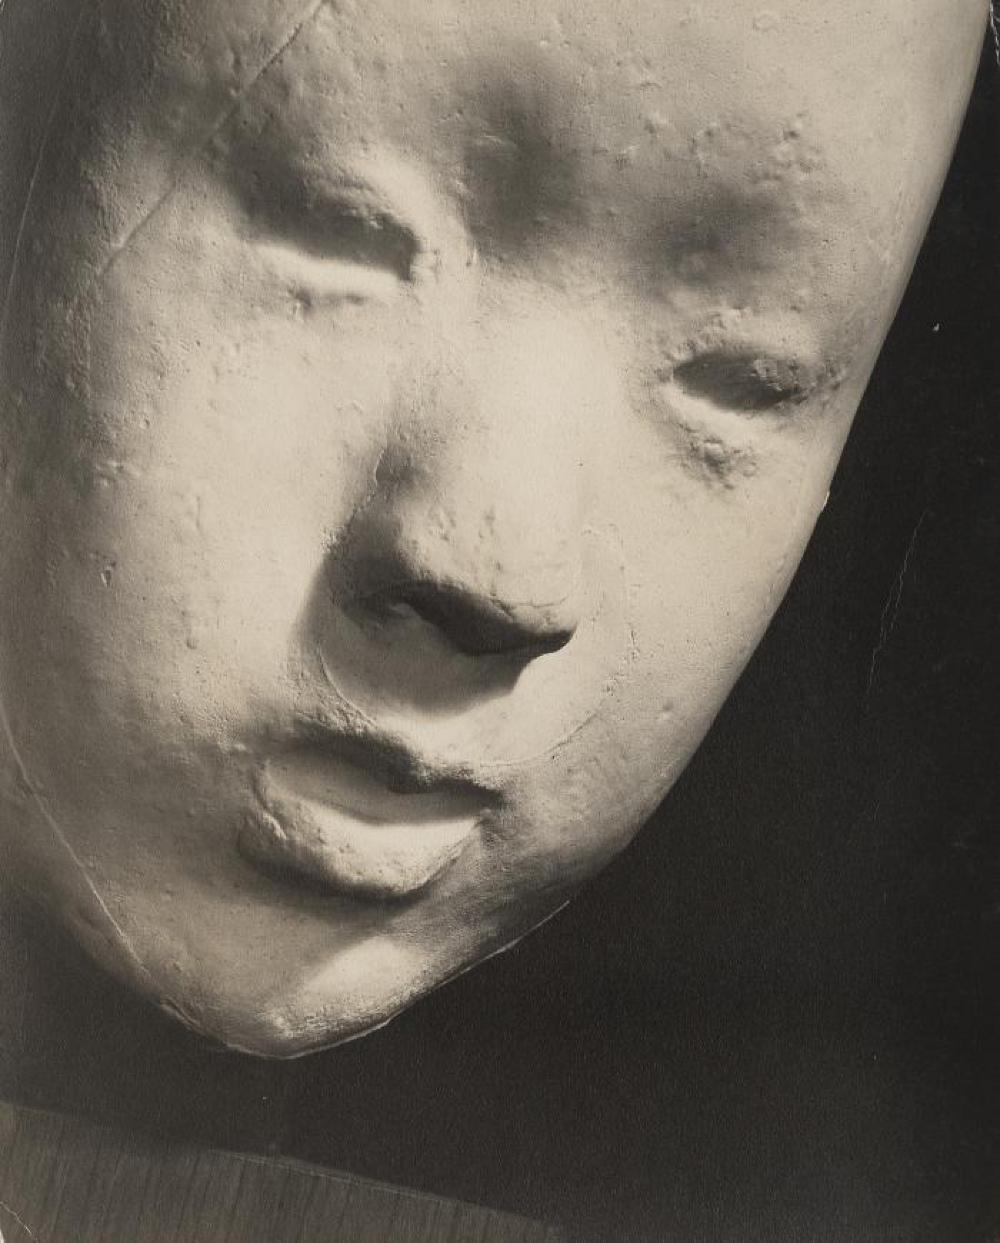 Tsuneko-san, image 2